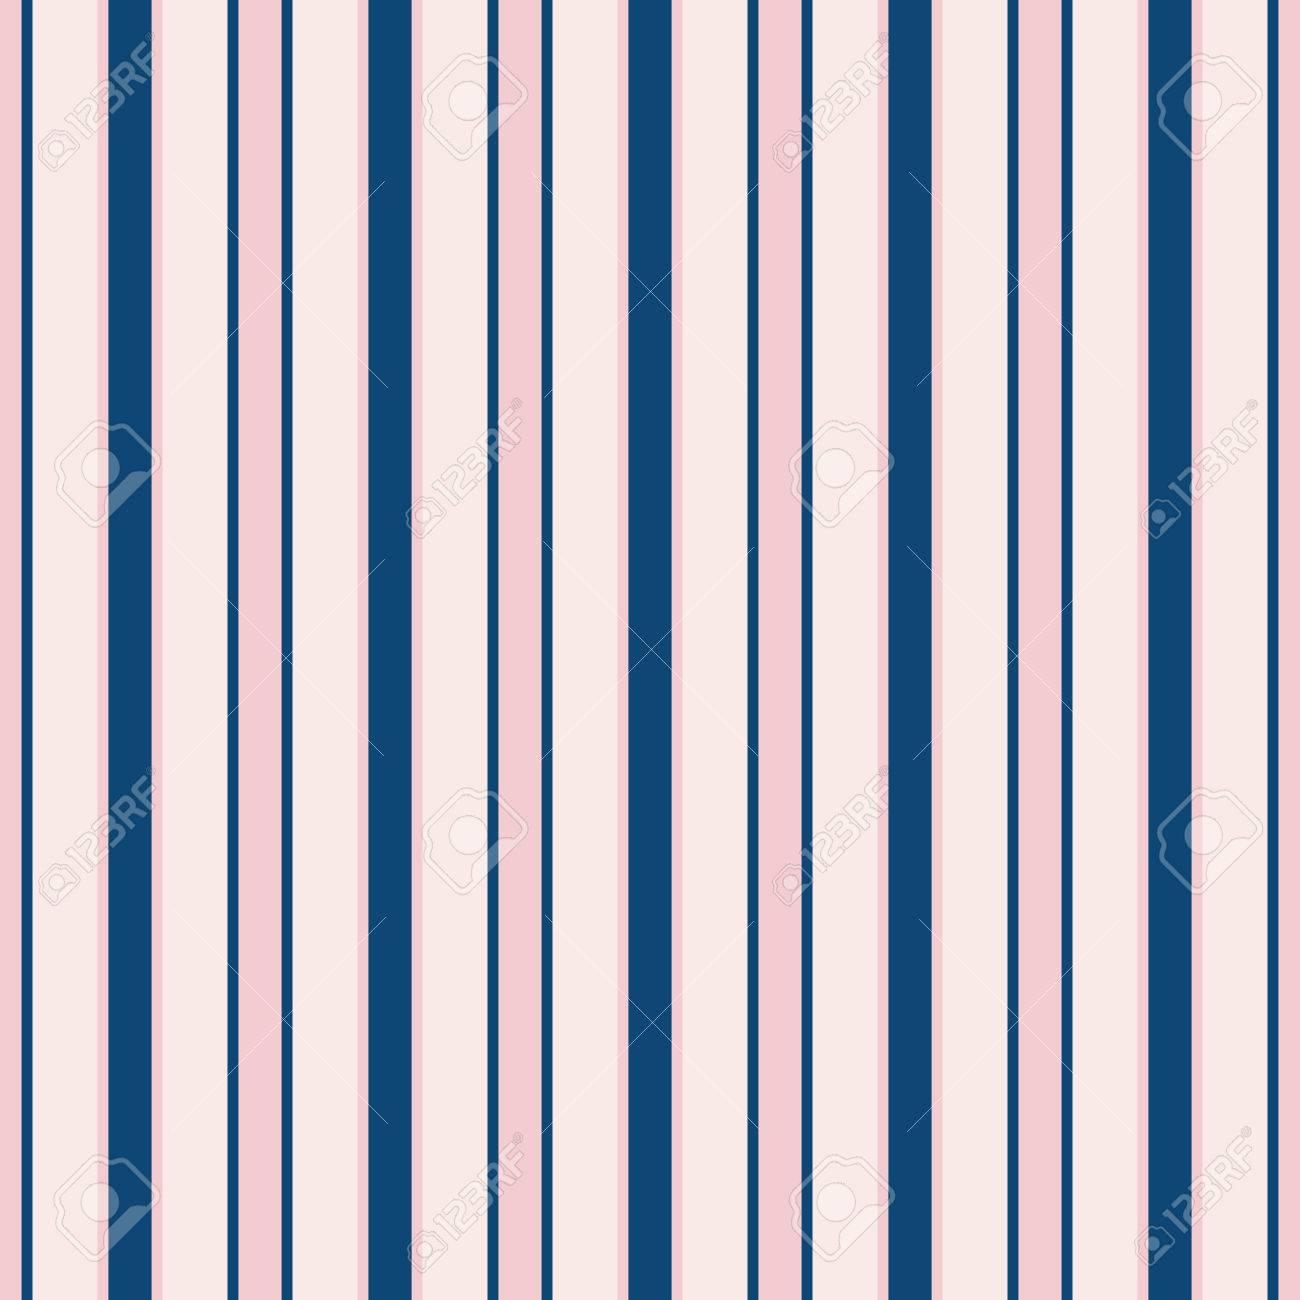 6d7e77719e57 Vertical Stripes Vector Seamless Pattern. Modern Texture In Trendy ...